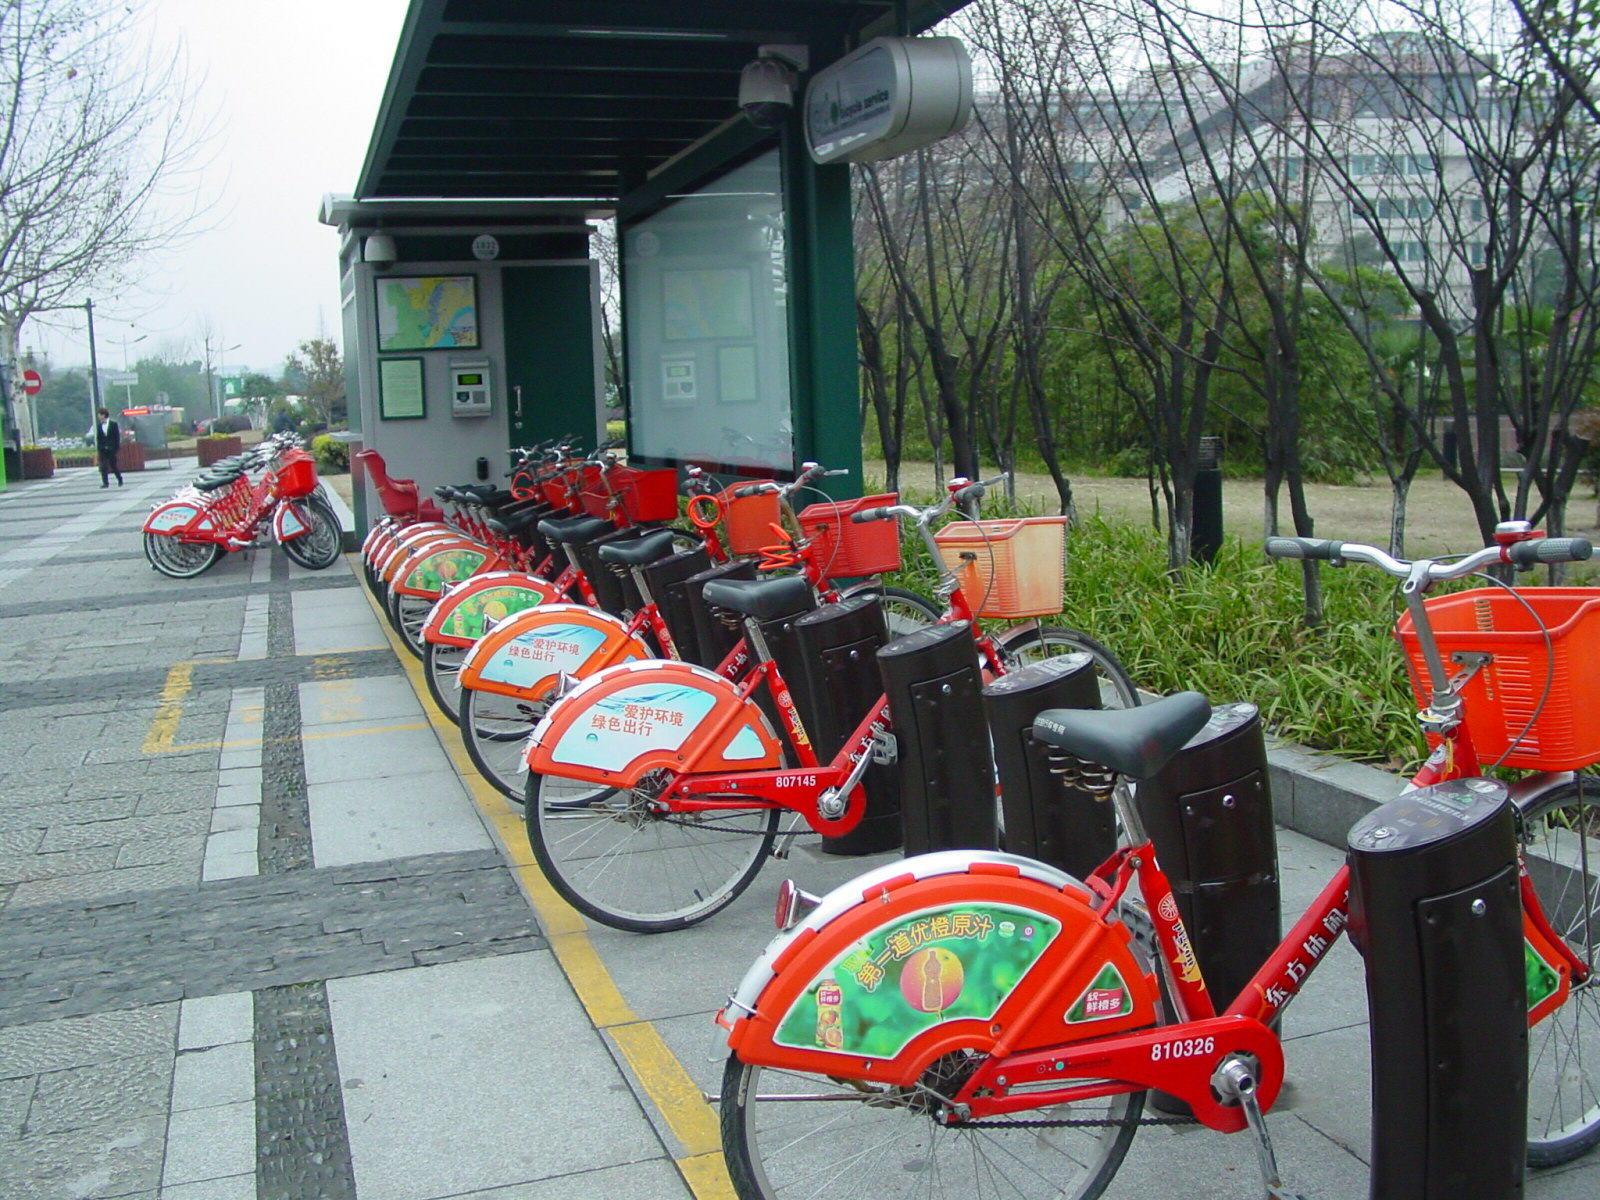 Service_bicyclette_hangzhou_zhongguo, Źródło: http://zh.wikipedia.org/